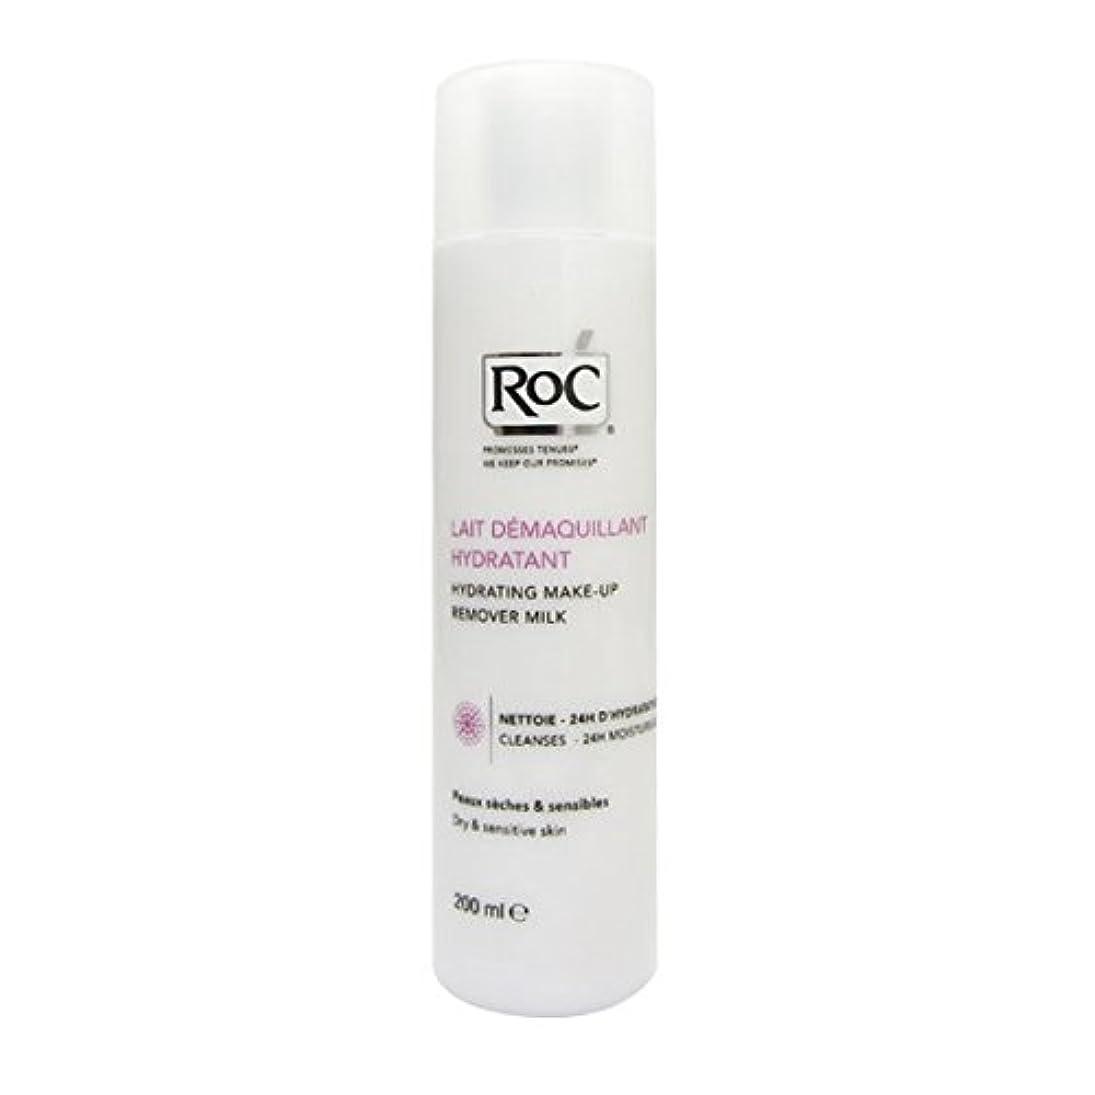 Roc Moisturizing Cleansing Milk 200ml [並行輸入品]